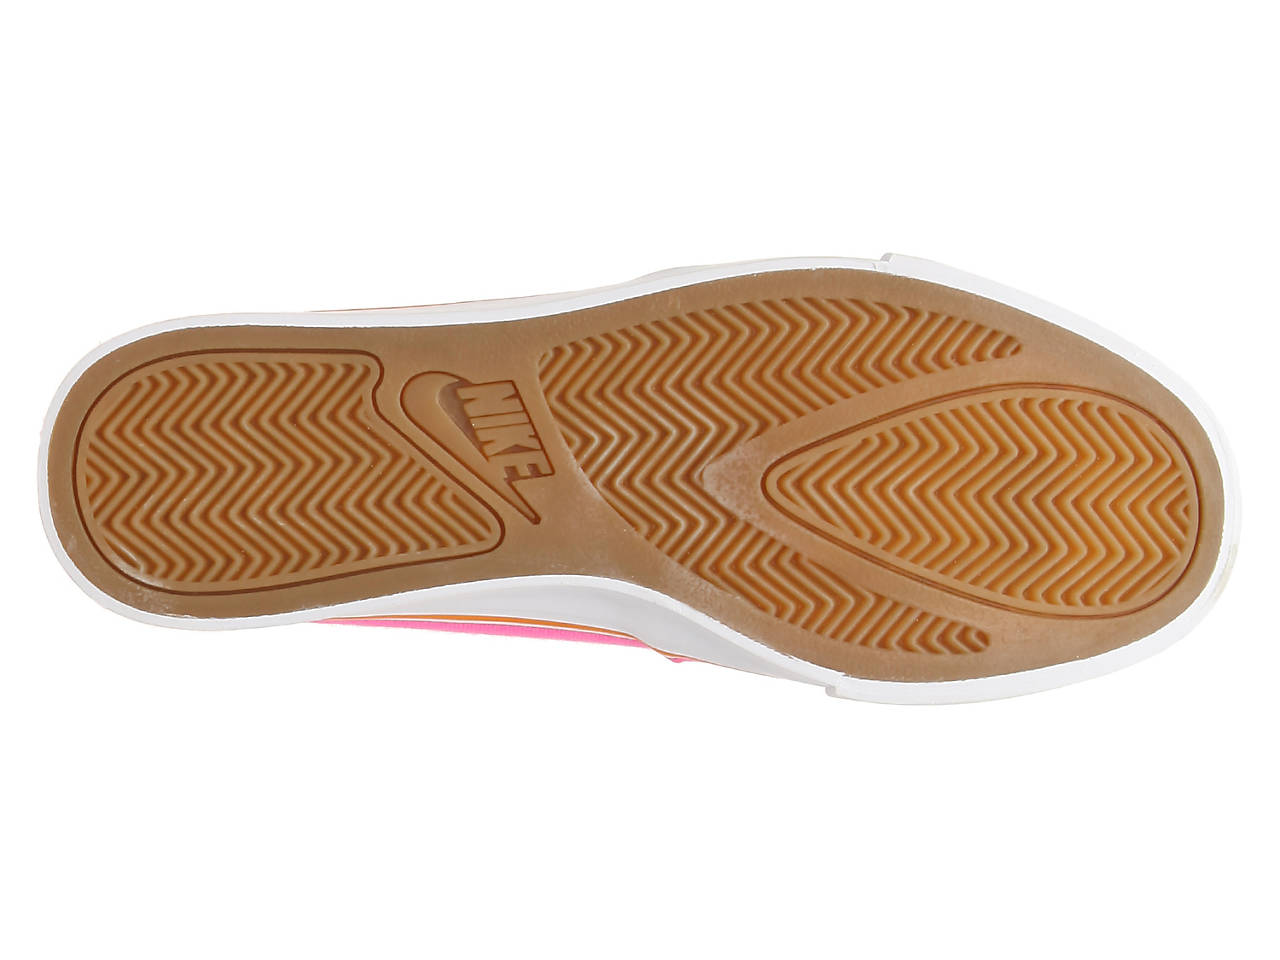 Nike Court Royale AC Slip On Sneaker Women's Women's Shoes